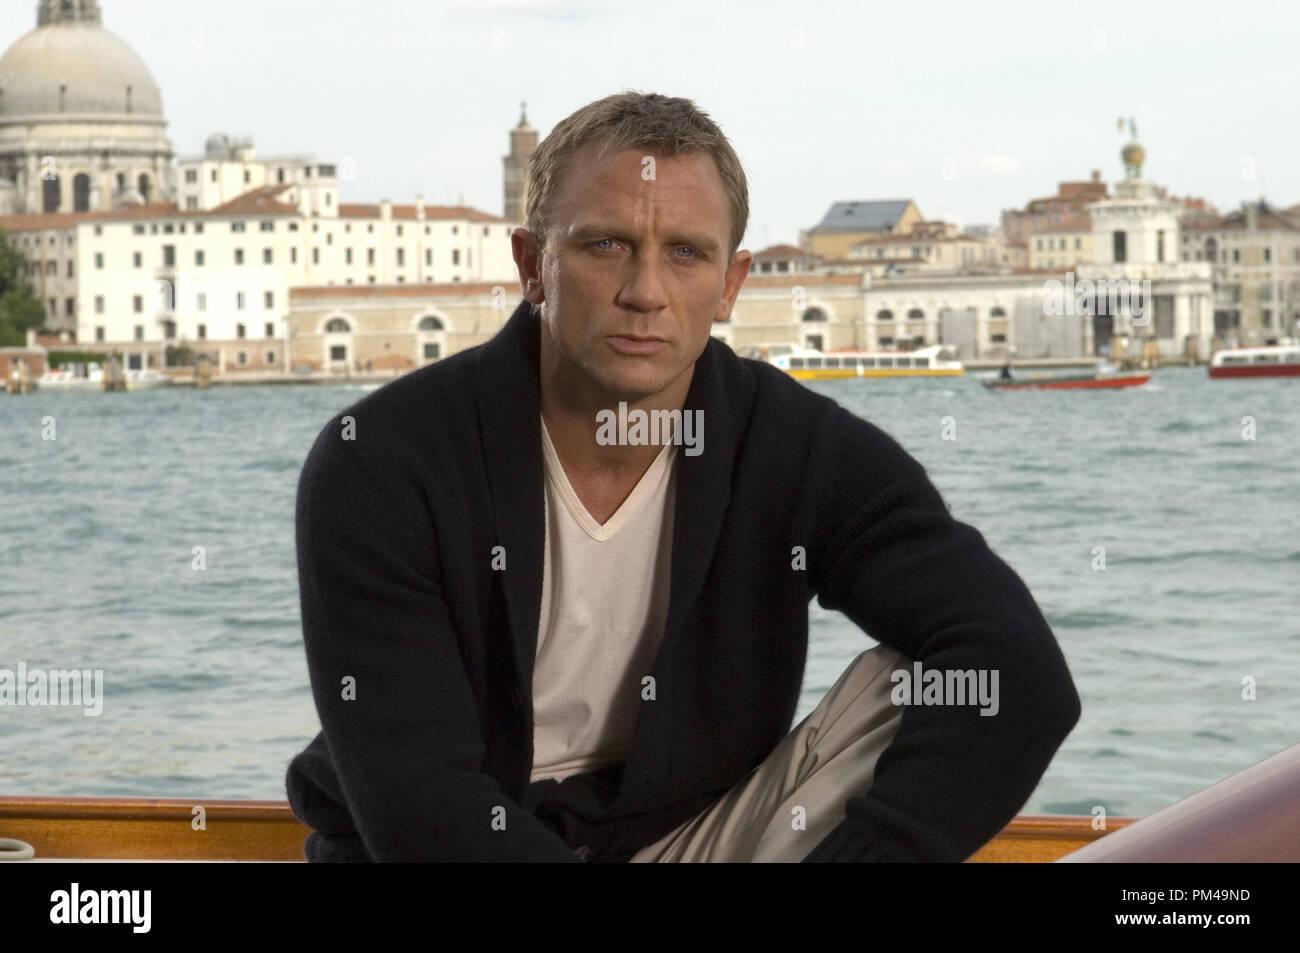 9575ed92f3 Casino Royale Daniel Craig Stock Photos & Casino Royale Daniel Craig ...